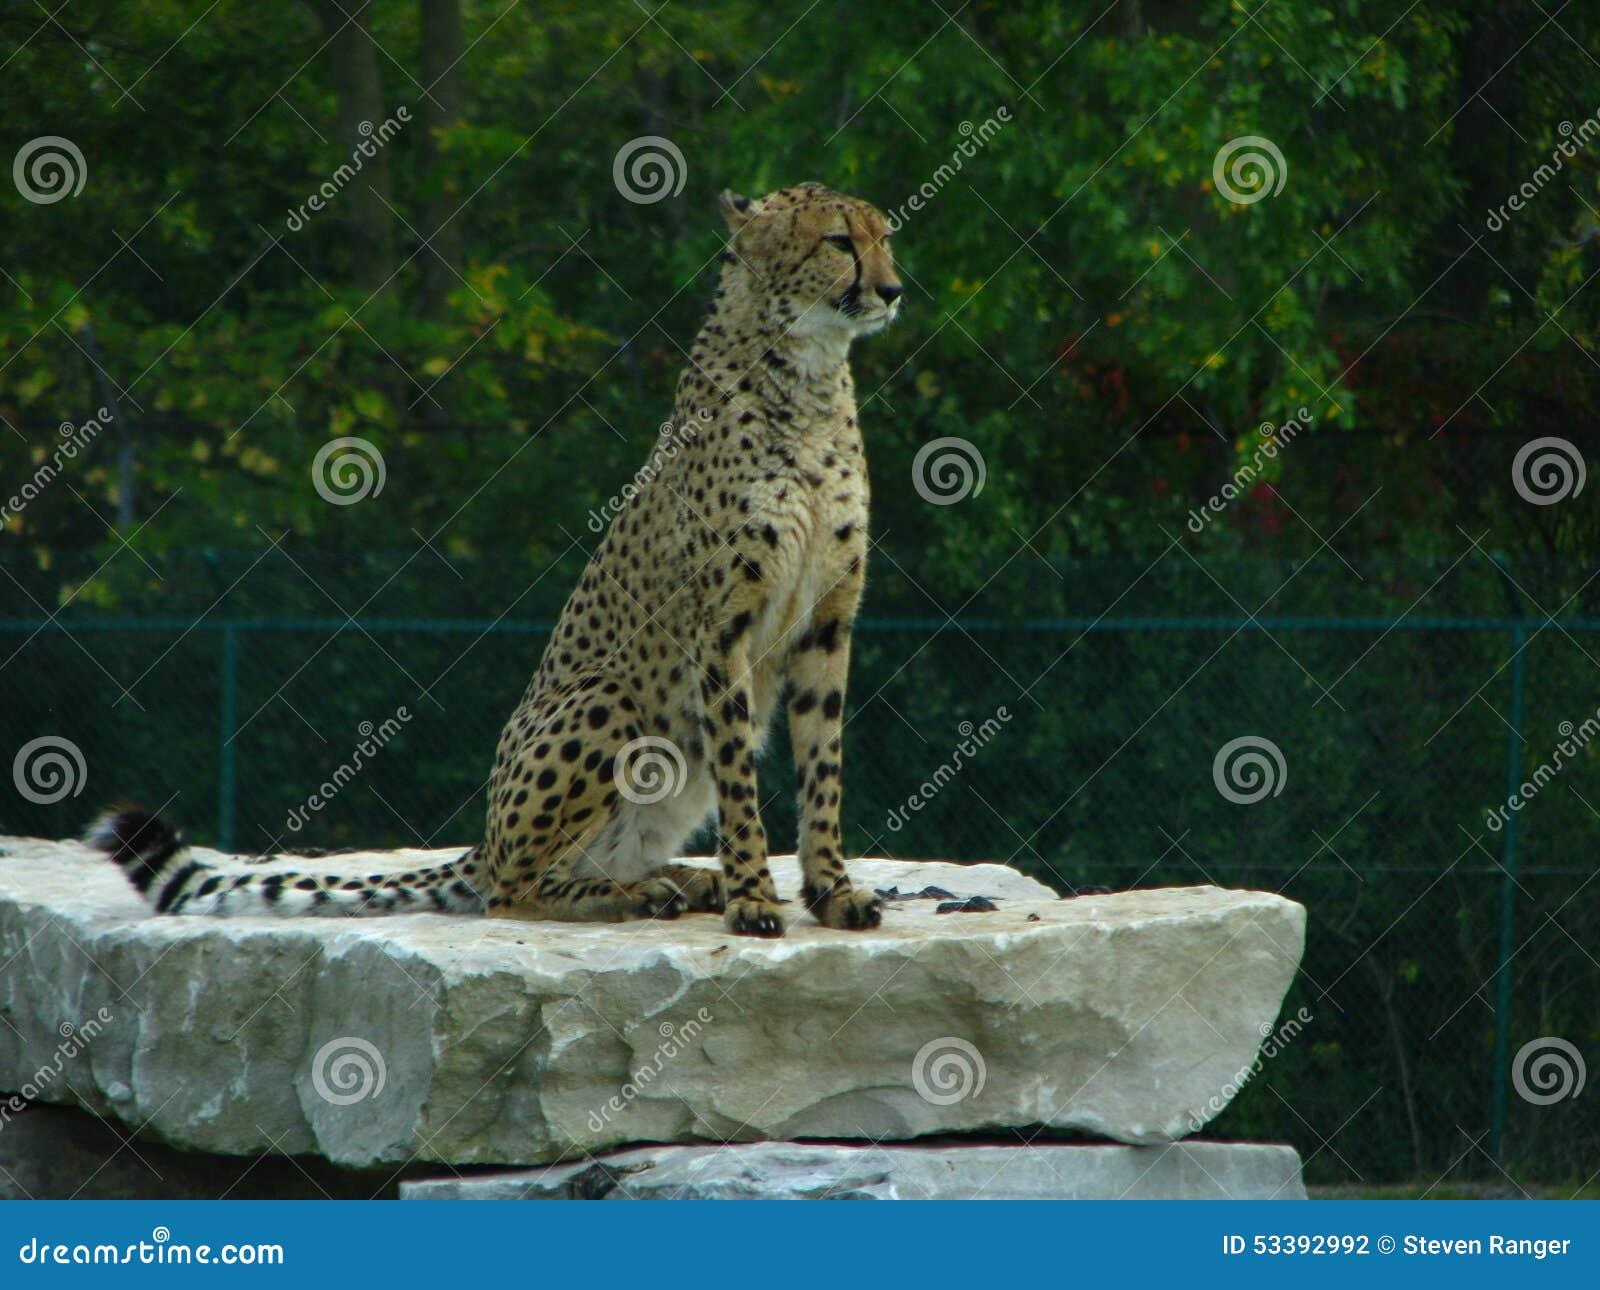 African cheetah sitting on a rock ledge.